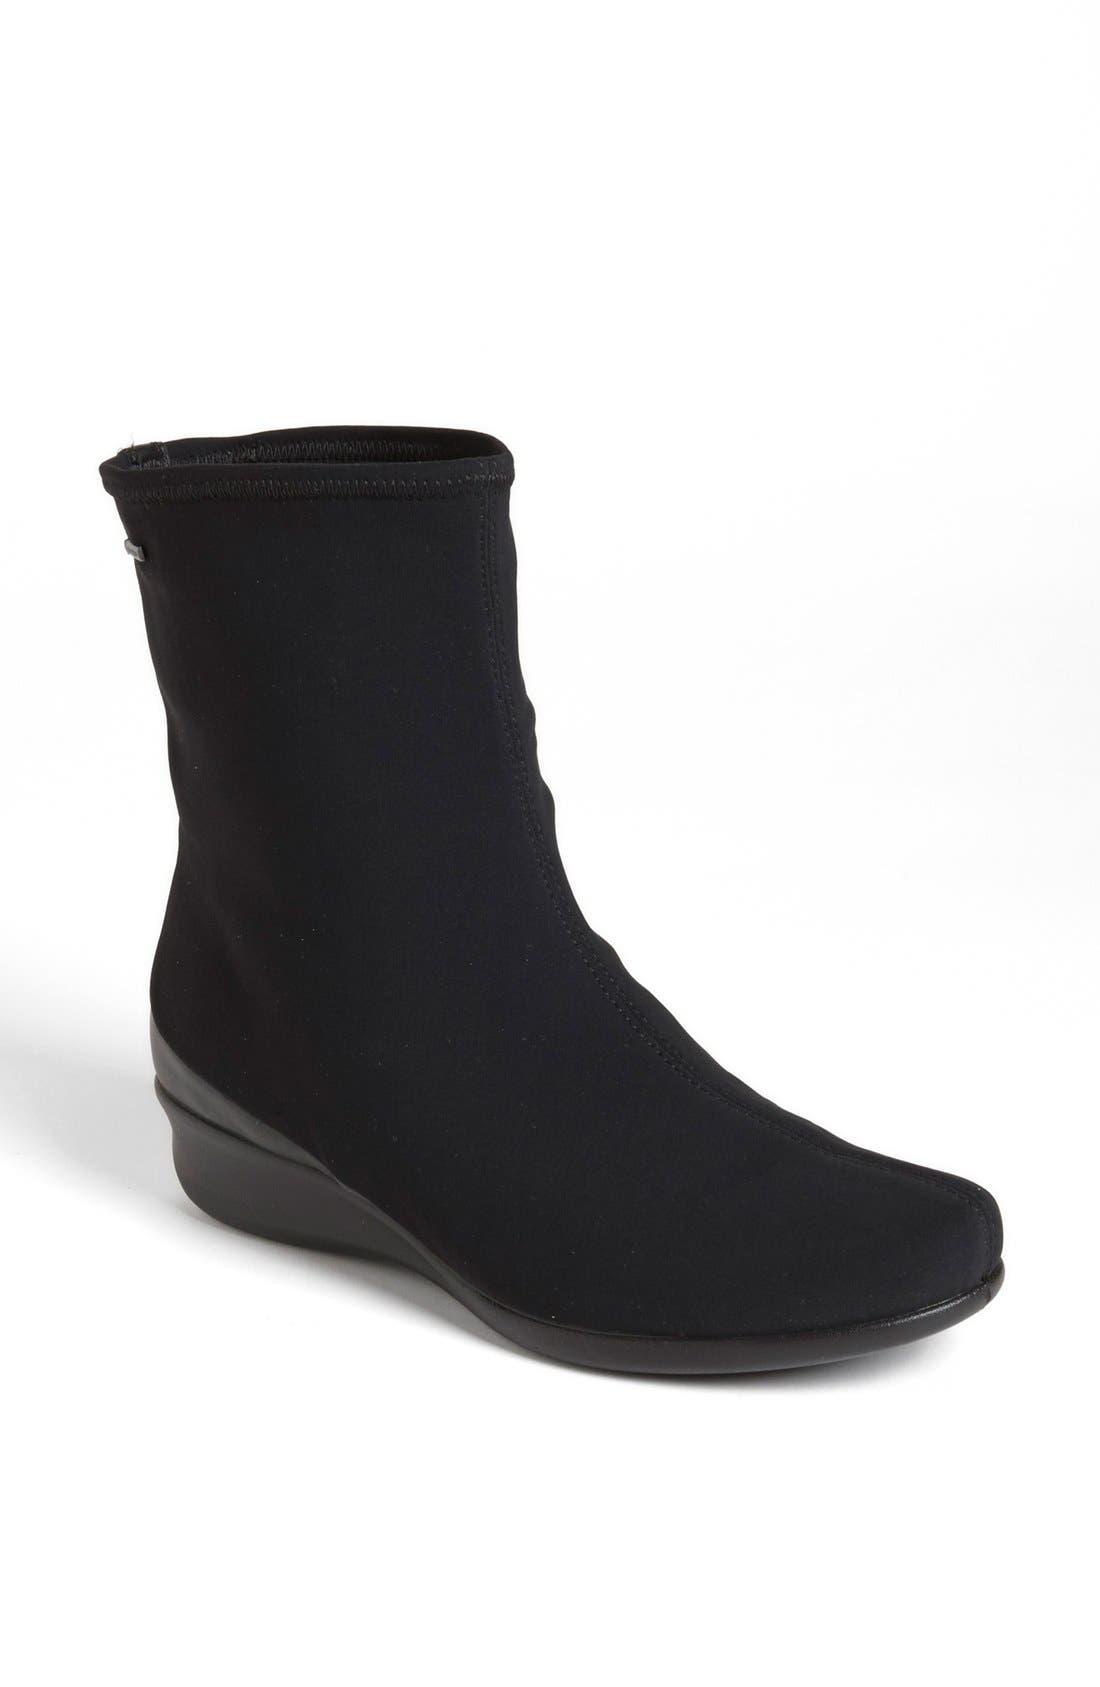 Alternate Image 1 Selected - ECCO 'Abelone' Boot